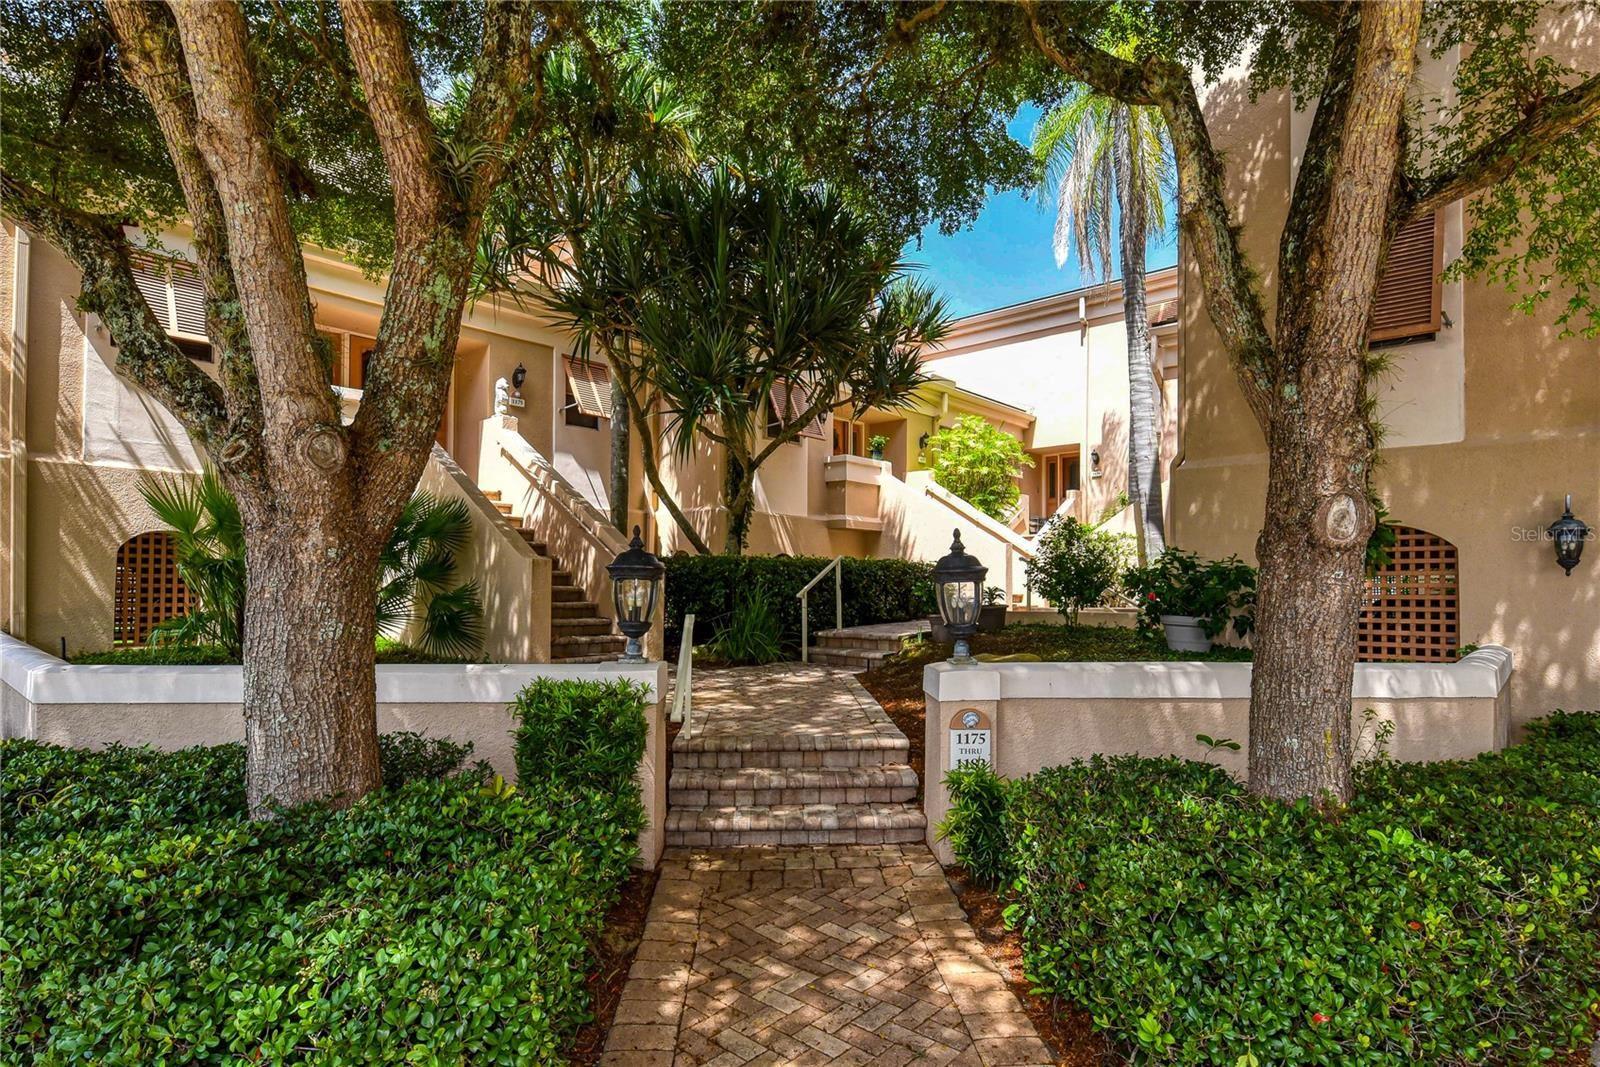 1177 COQUILLE STREET #302, Sarasota, FL 34242 - #: A4510483